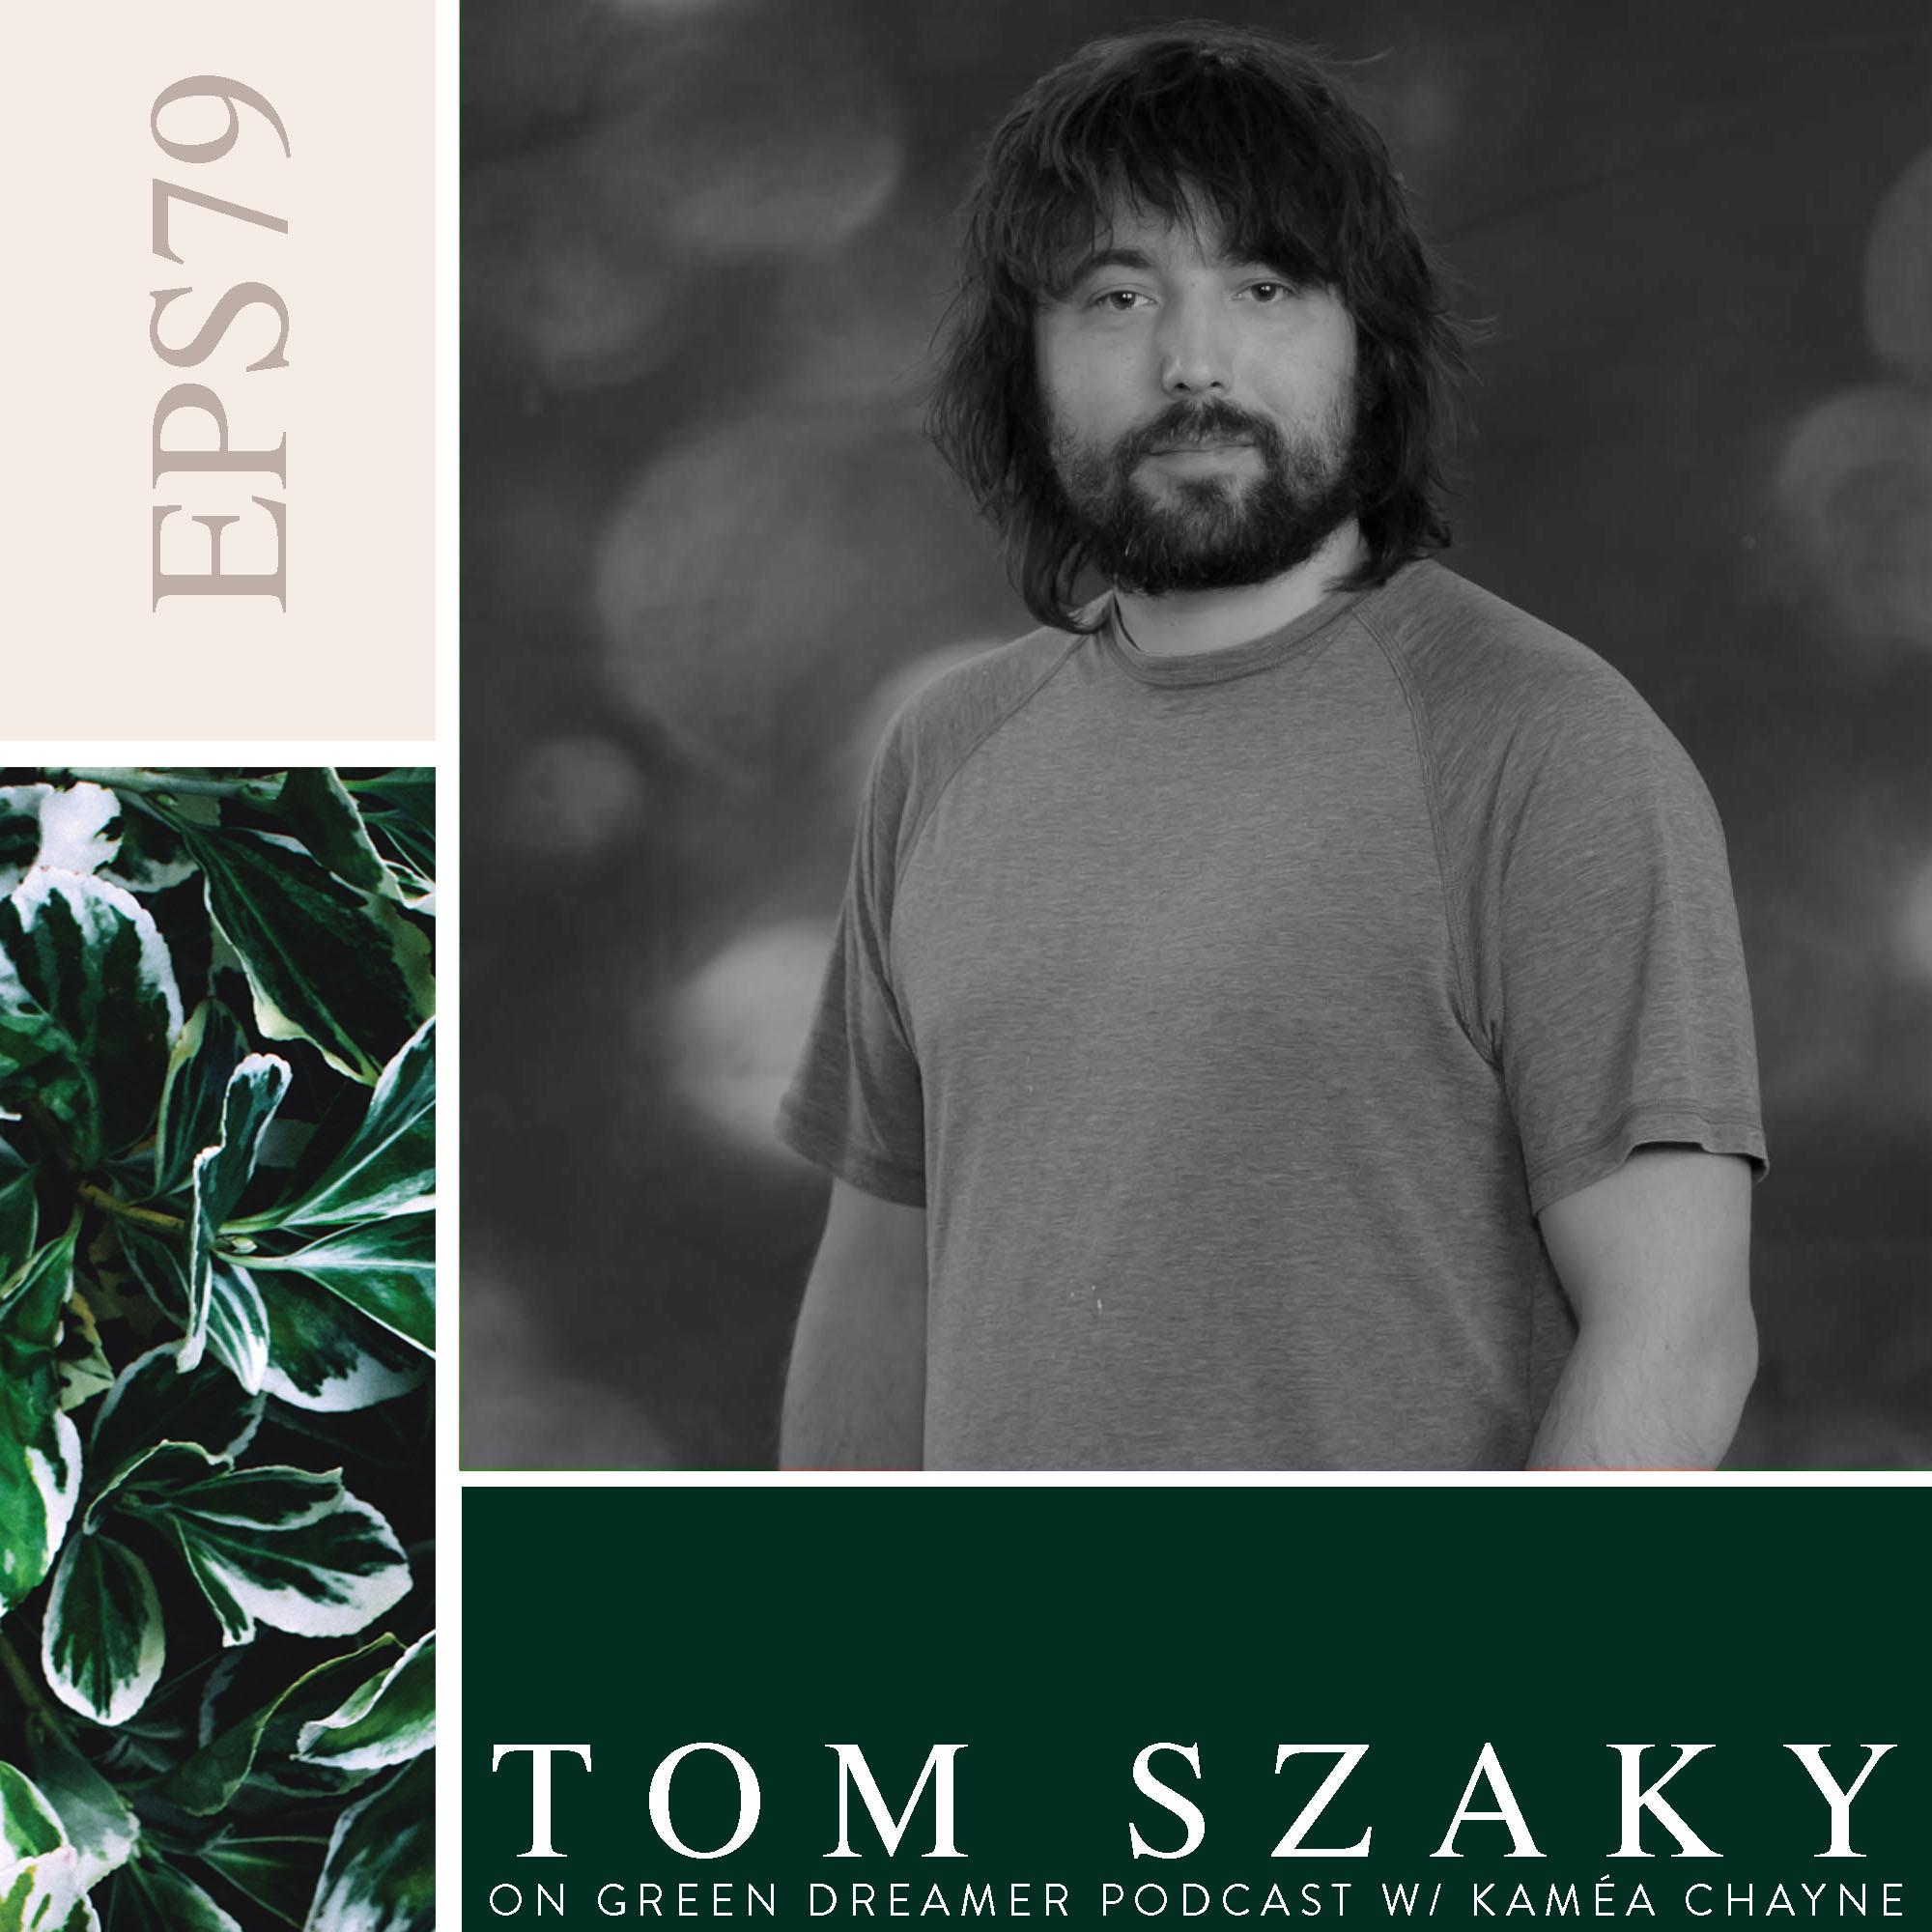 79-Tom-Szaky-of-TerraCycle-talks-Sustainability-on-Green-Dreamer-Podcast-with-Kamea-Chayne.jpg